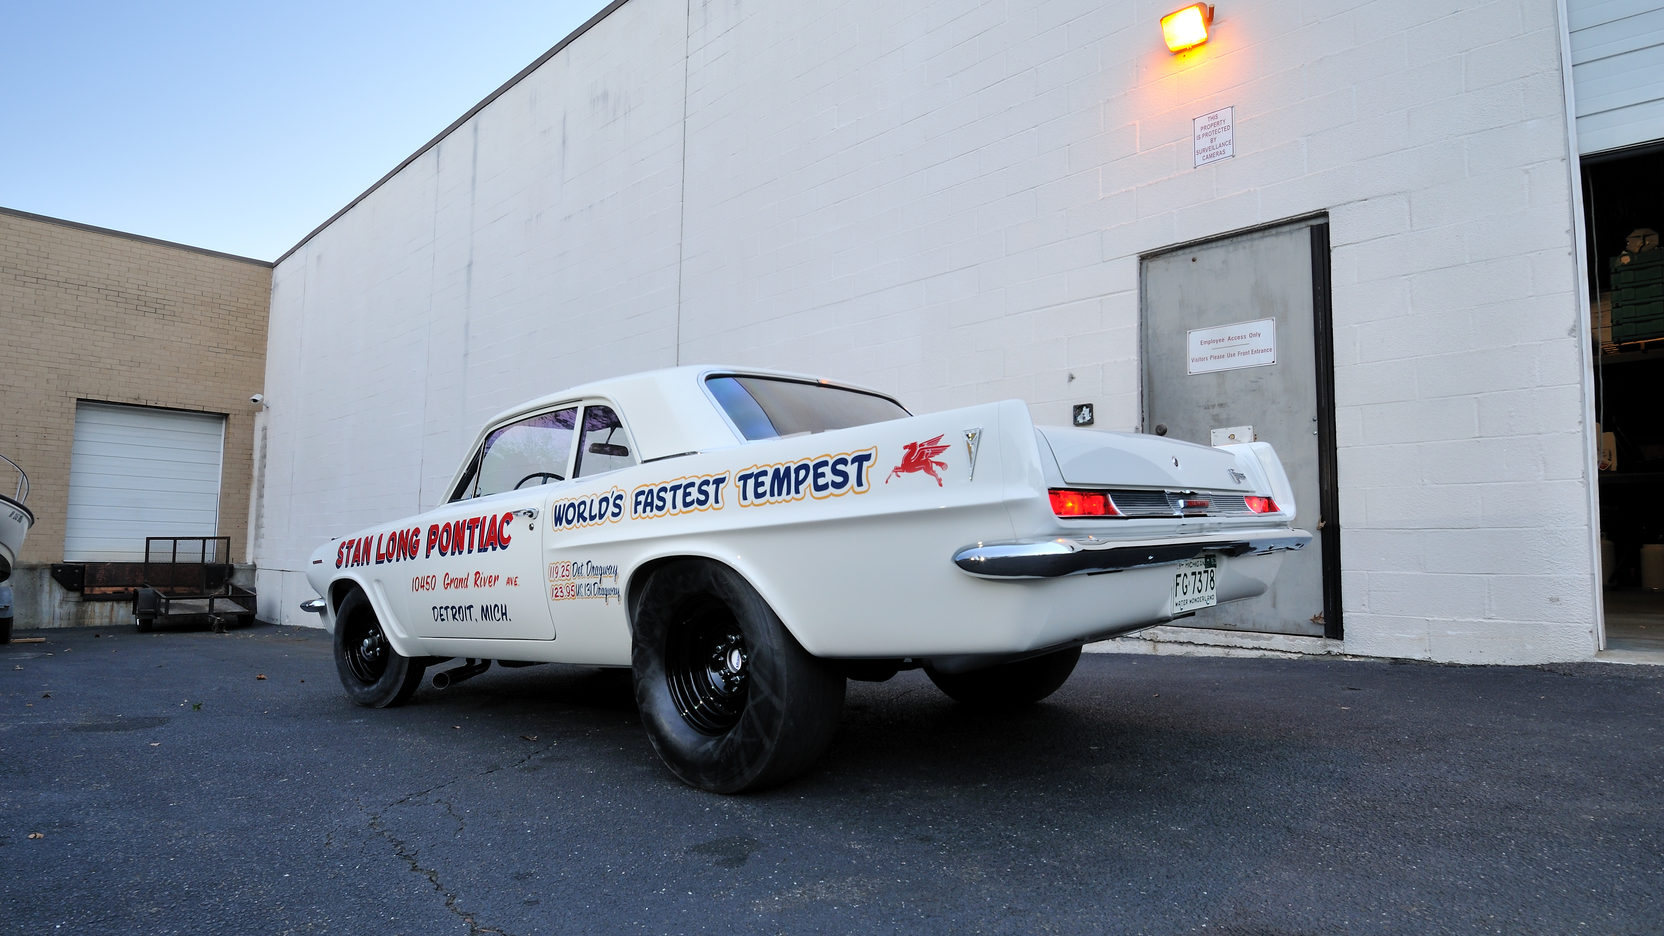 1963 Pontiac Tempest Super Duty rear 3/4 tires